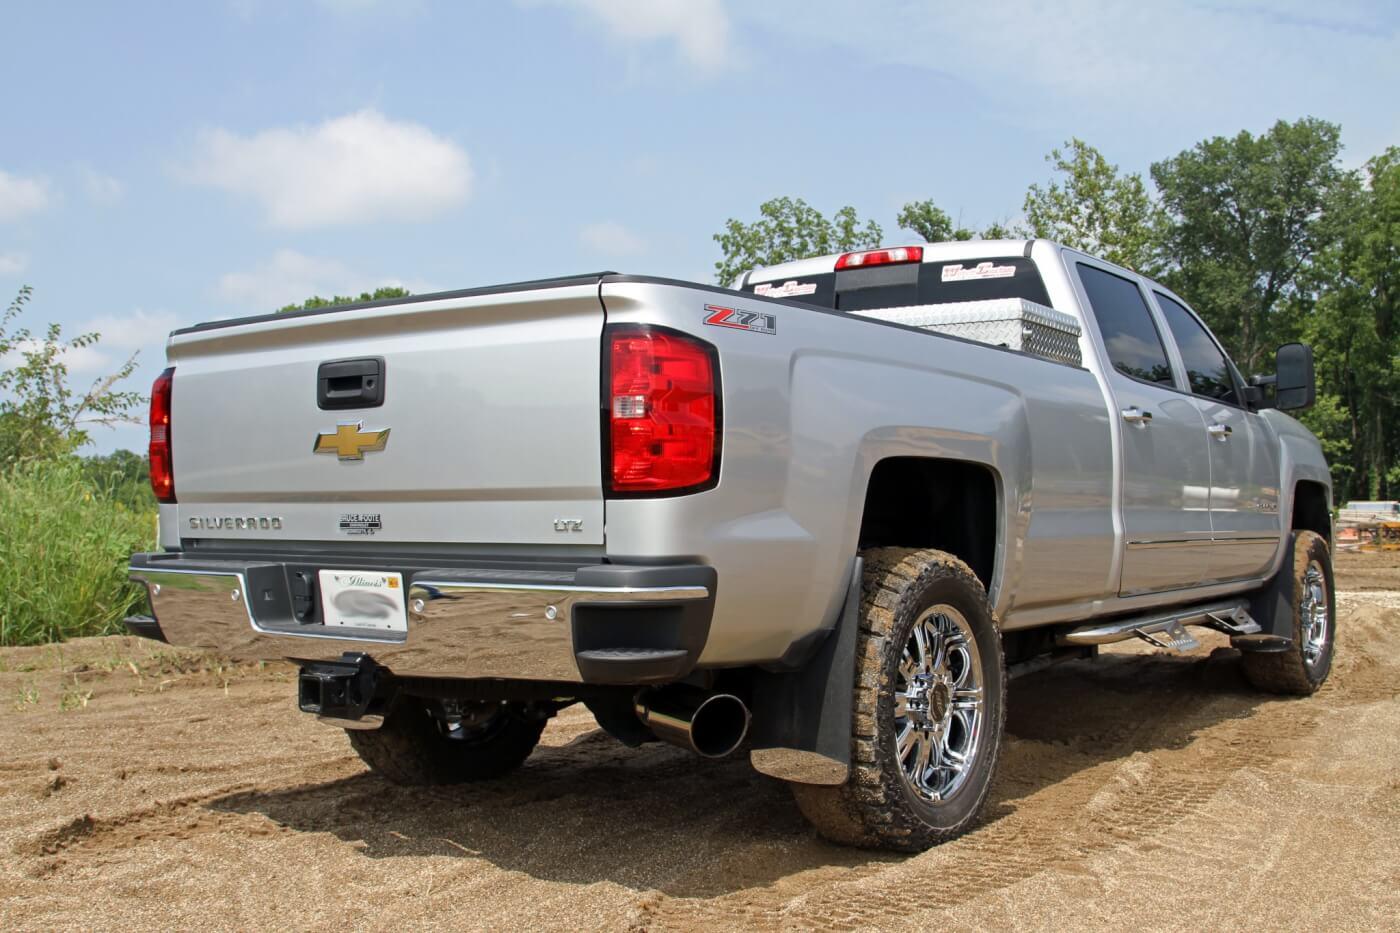 129 0301 Ohio 4 Wheel Jamboree Trucks besides Gm Leveling Lift Kit 1307 8 furthermore 5jxla Chevrolet 1500 Diagram Instructions Showing as well Gm Engine Mounts likewise 371157072367. on chevy silverado pitman arm